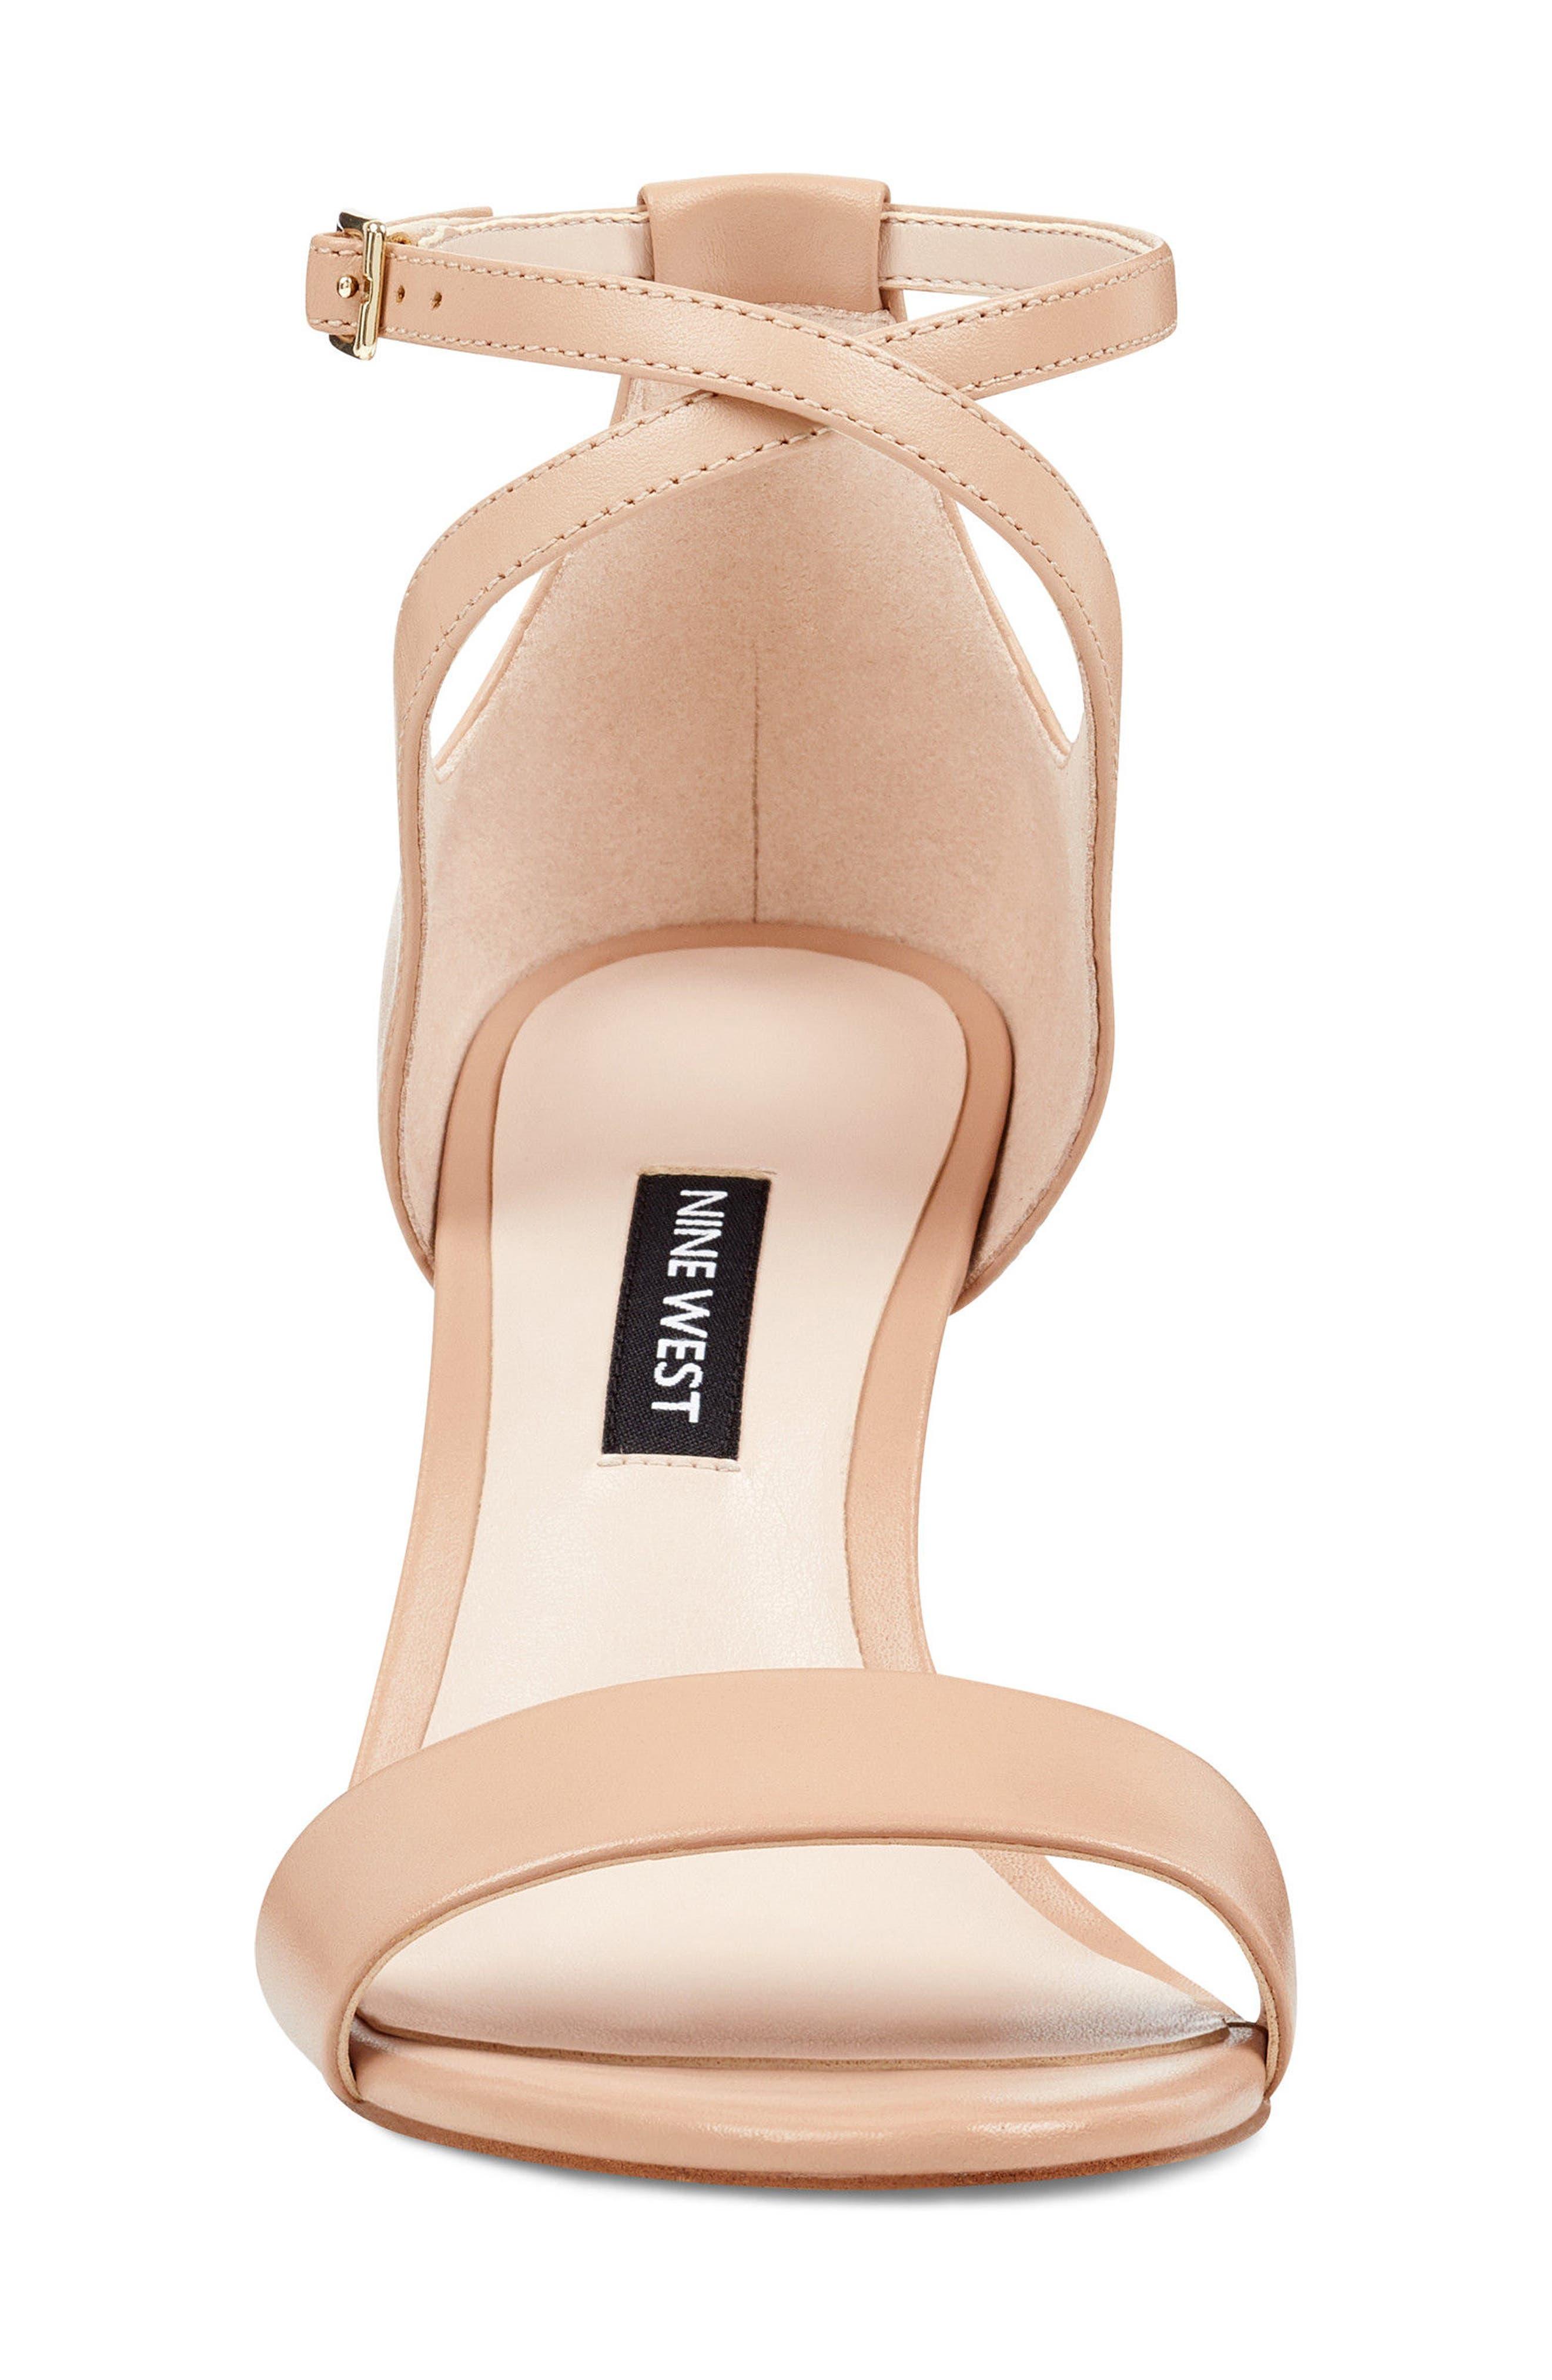 Nunzaya Ankle Strap Sandal,                             Alternate thumbnail 4, color,                             270